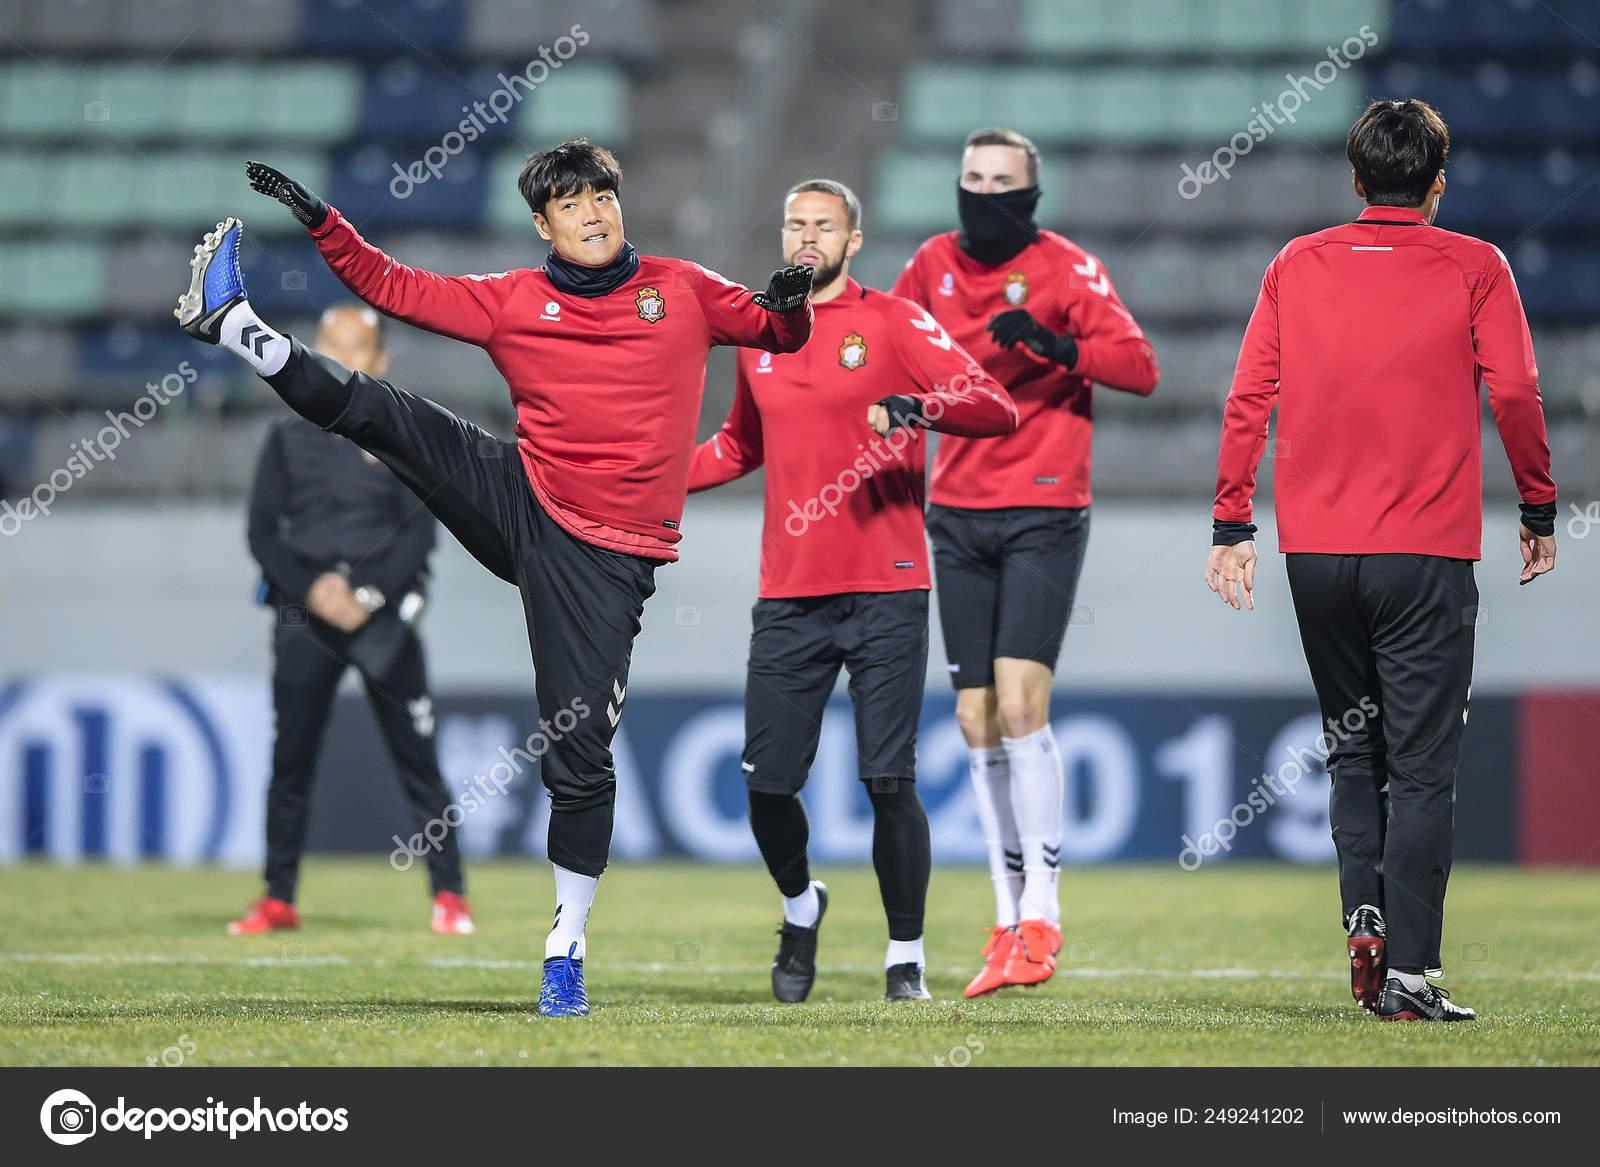 20a9872b SOUTH KOREA 2019 AFC CHAMPIONS LEAGUE GYEONGNAM FC – Stock Editorial ...